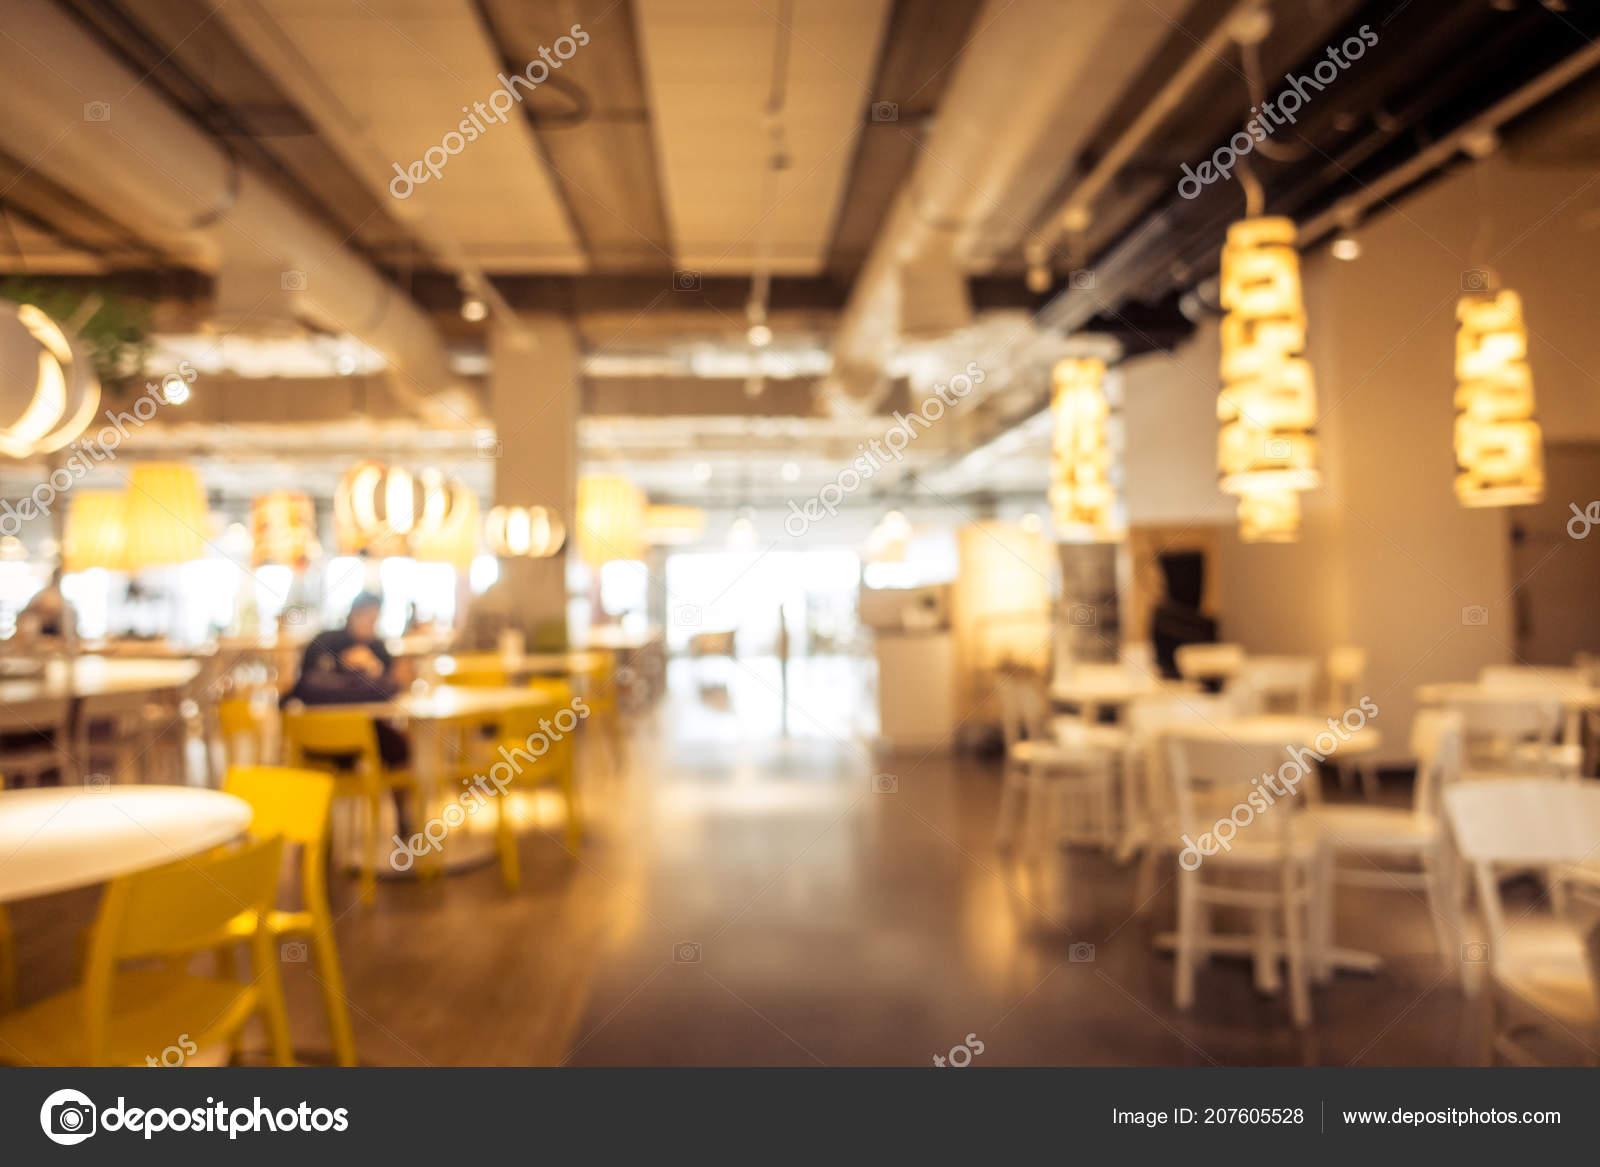 Abstract Blur Defocused Coffee Shop Cafe Restaurant Interior Background Stock Photo C Mrsiraphol 207605528